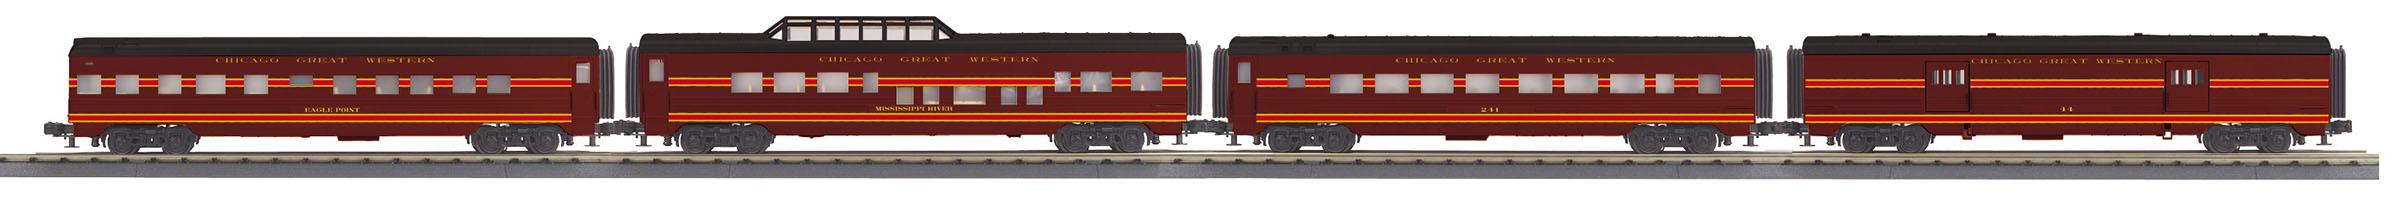 MTH 30-68144 4 Car 60' Streamlined Passenger Set 3 Rail RailKing Chicago Great Western 44